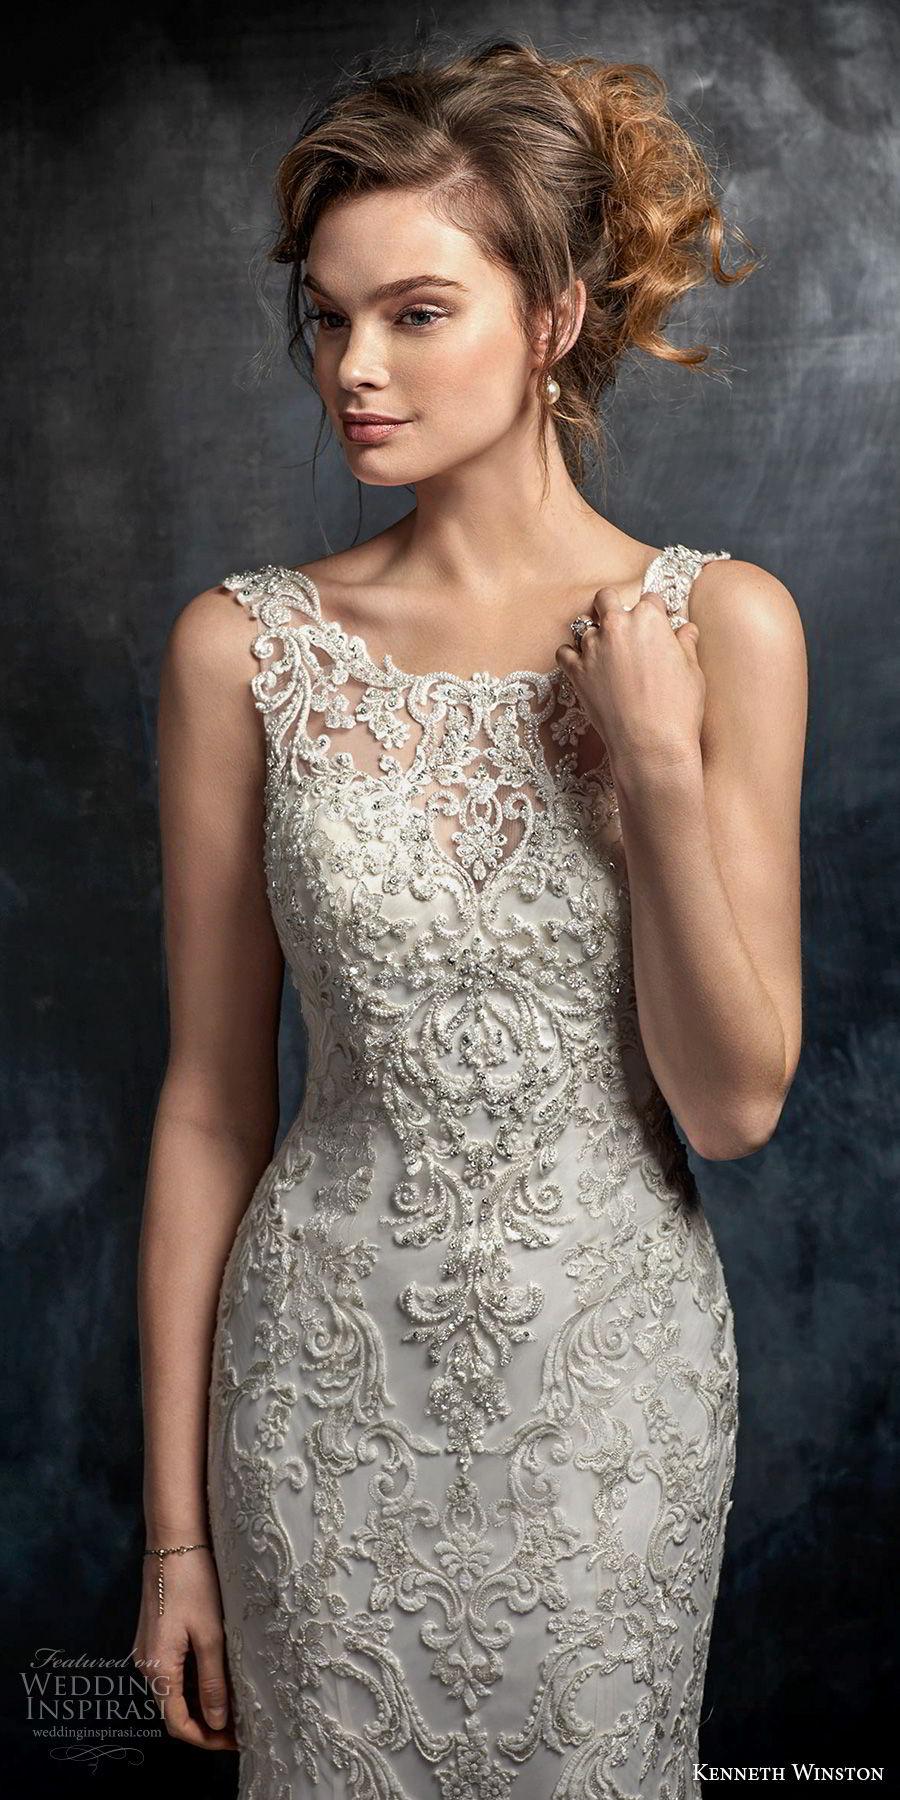 kenneth winston fall 2017 bridal sleeveless bateau neckline full embellishment elegant fit and flare sheath wedding dress open back medium train (30) zv